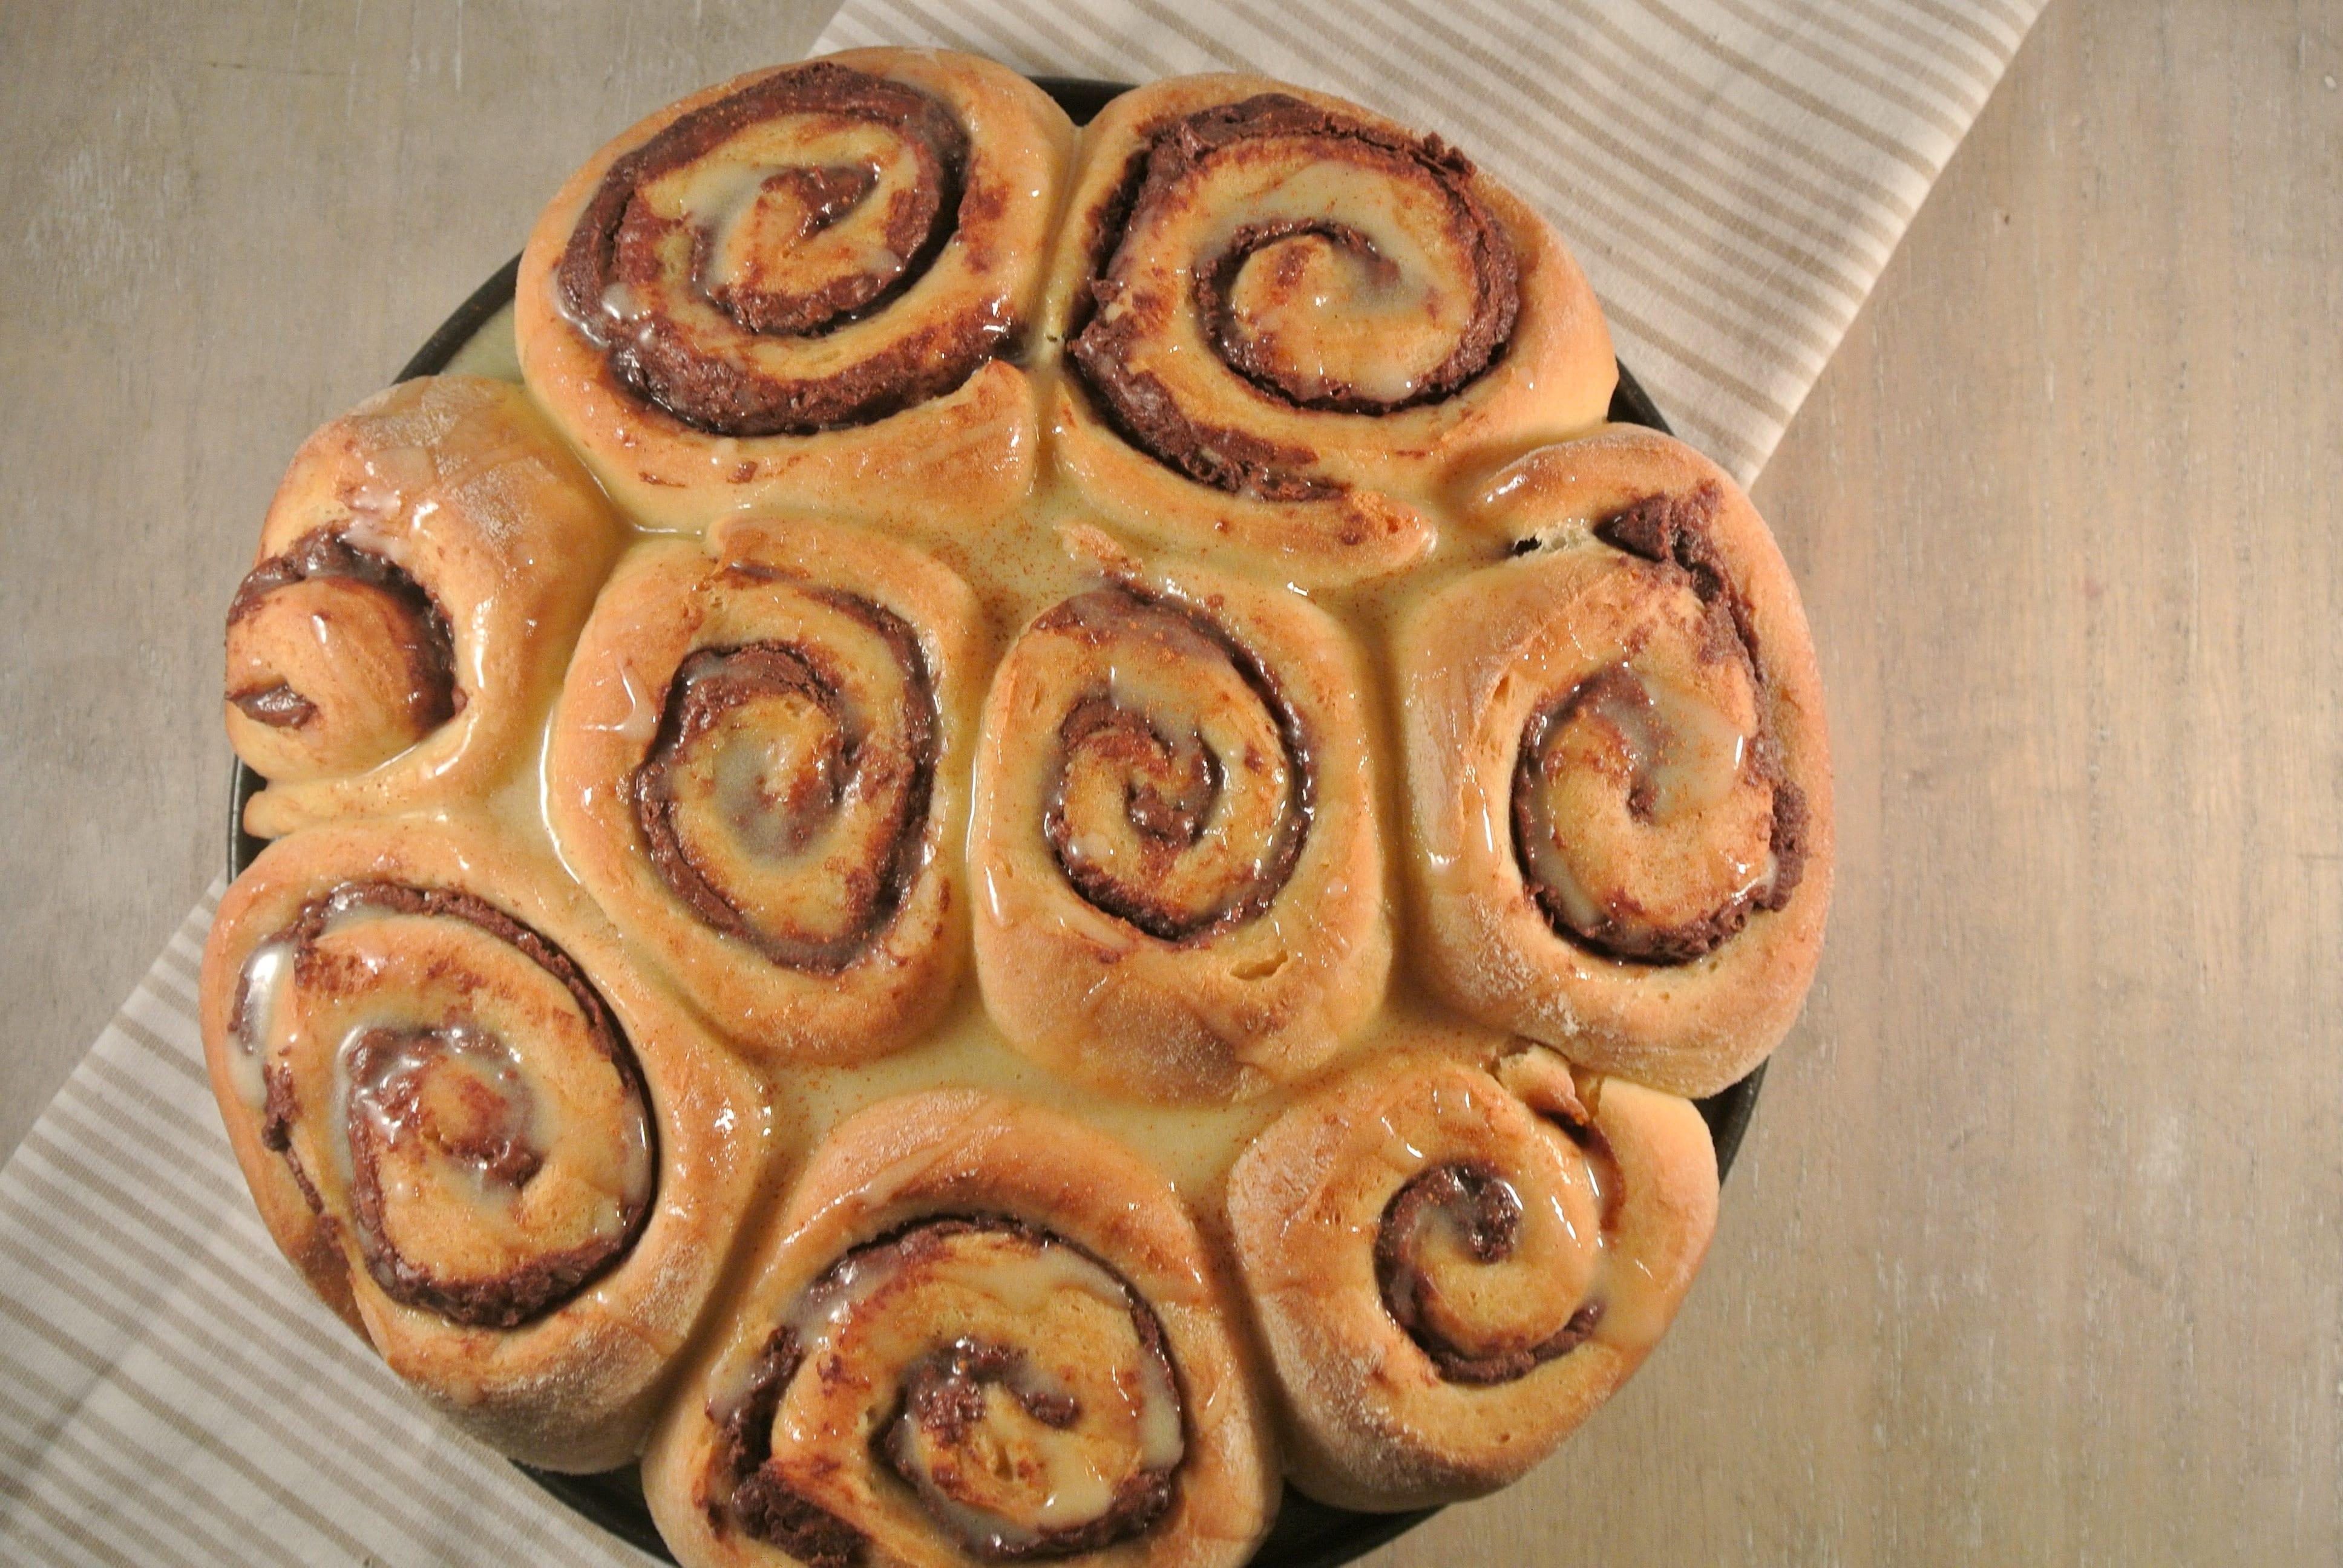 Kerstontbijt: Nutella-kaneelbroodjes